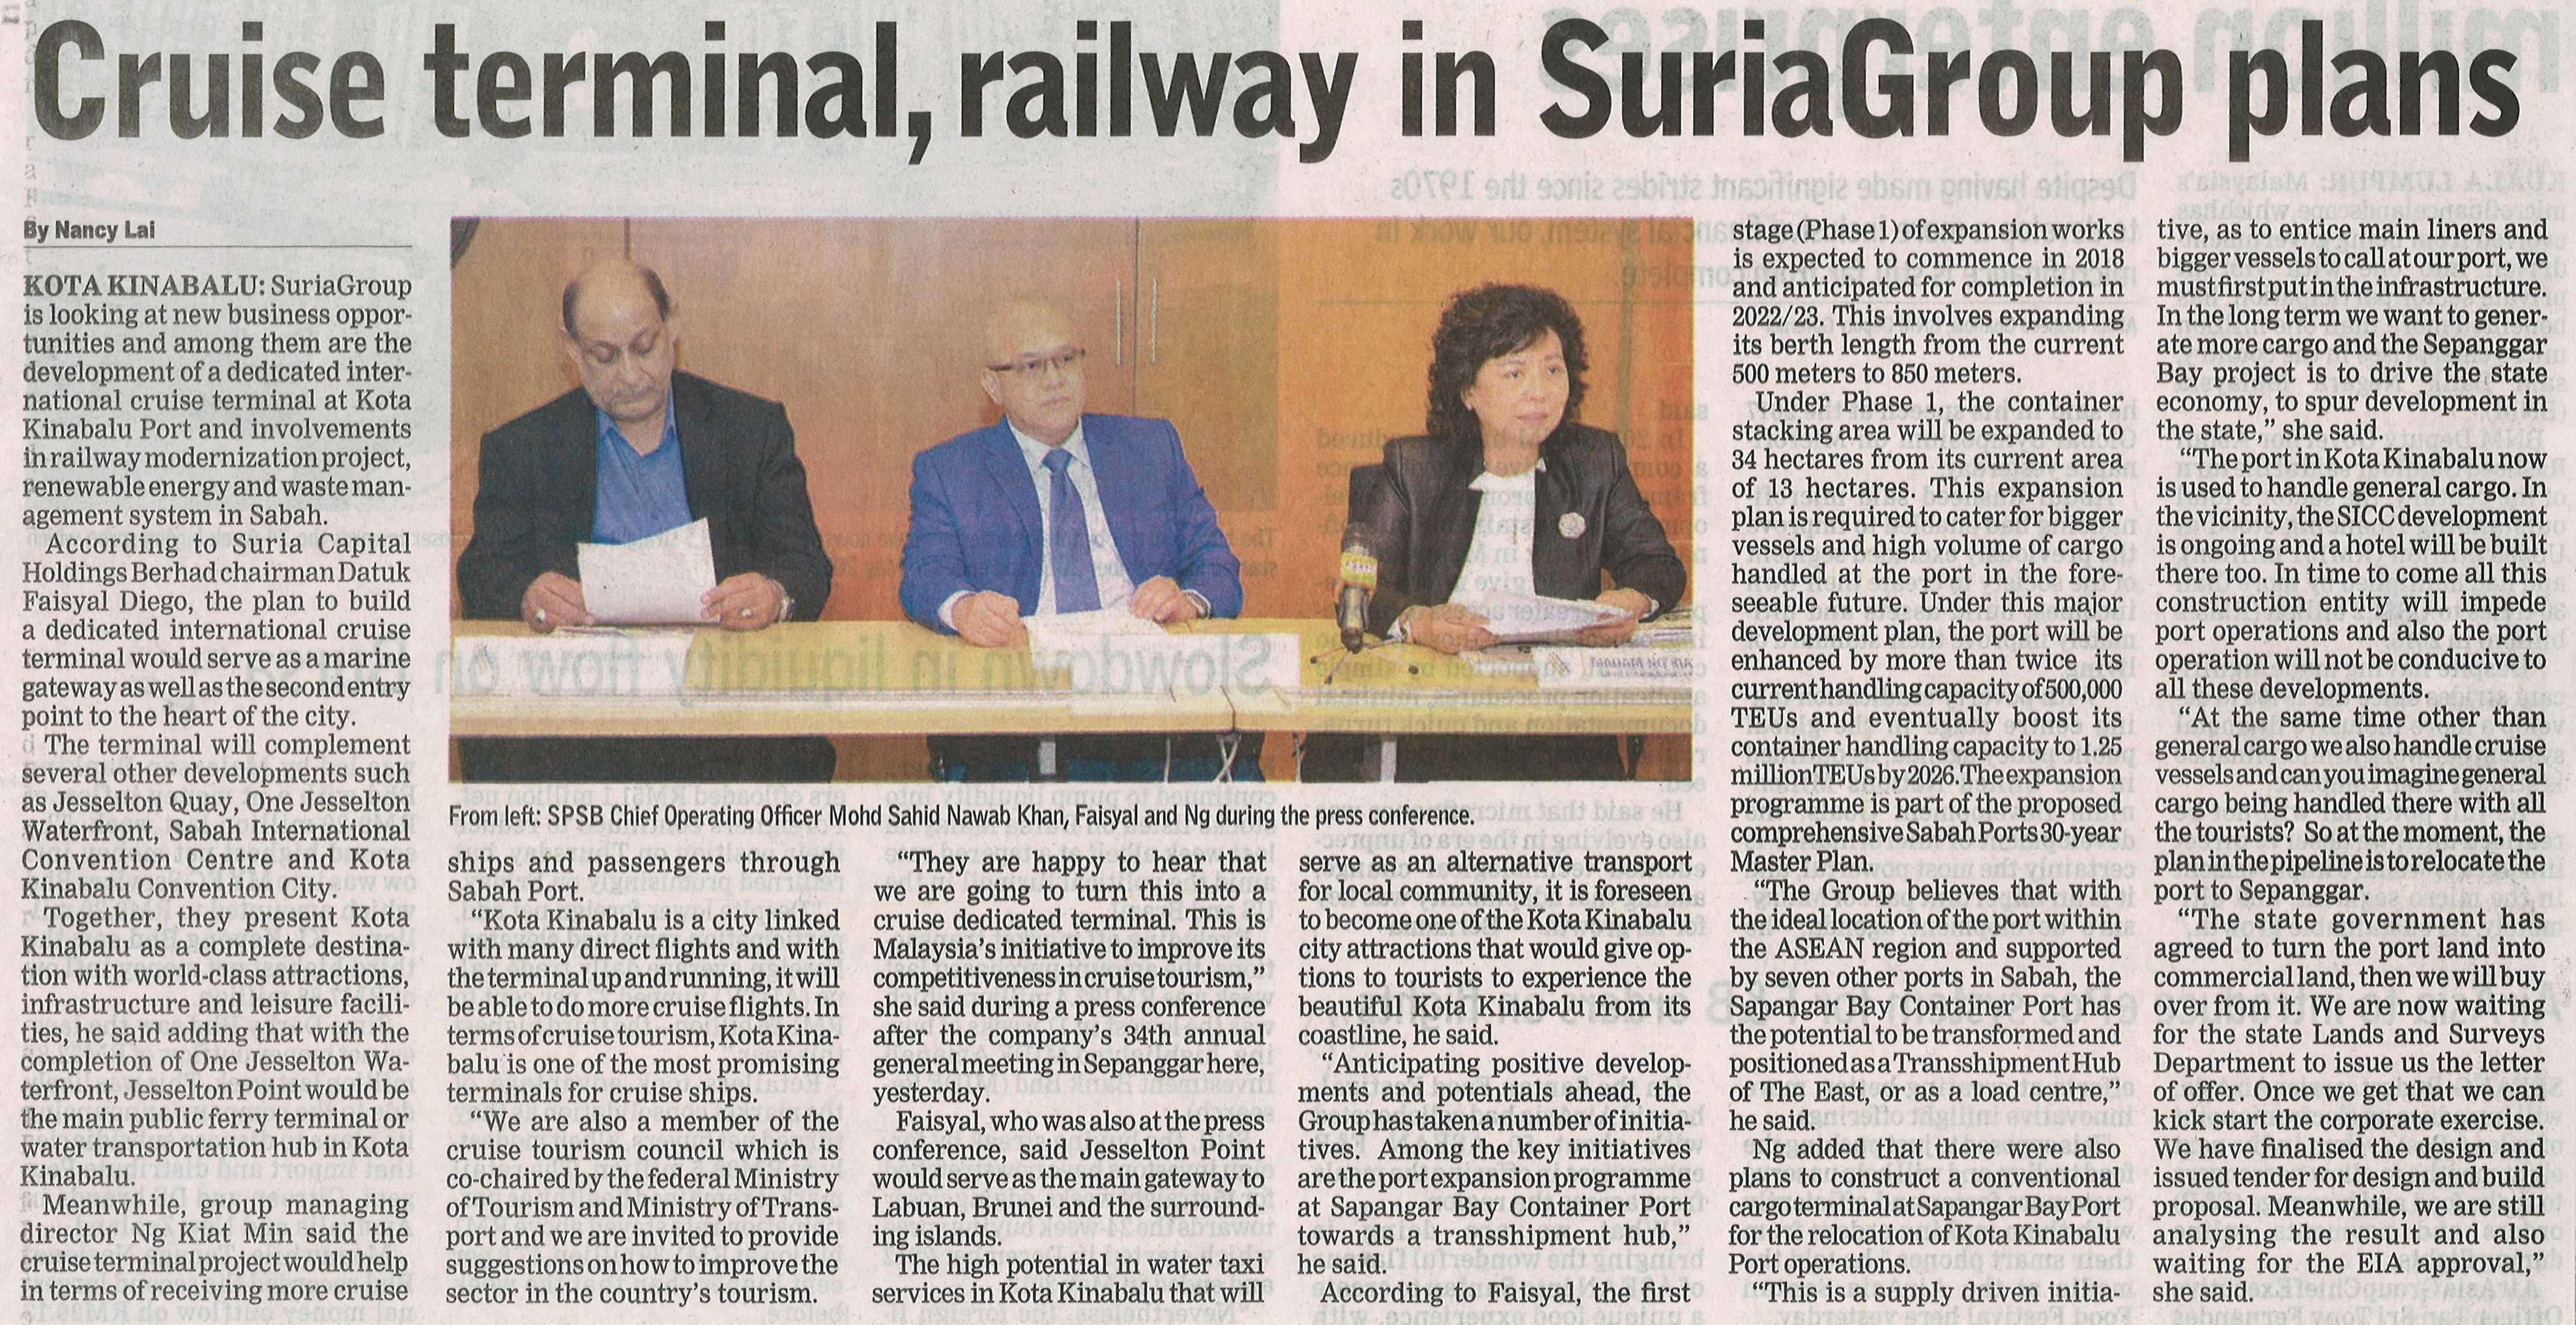 Cruise Terminal, Railway in SuriaGroup Plans